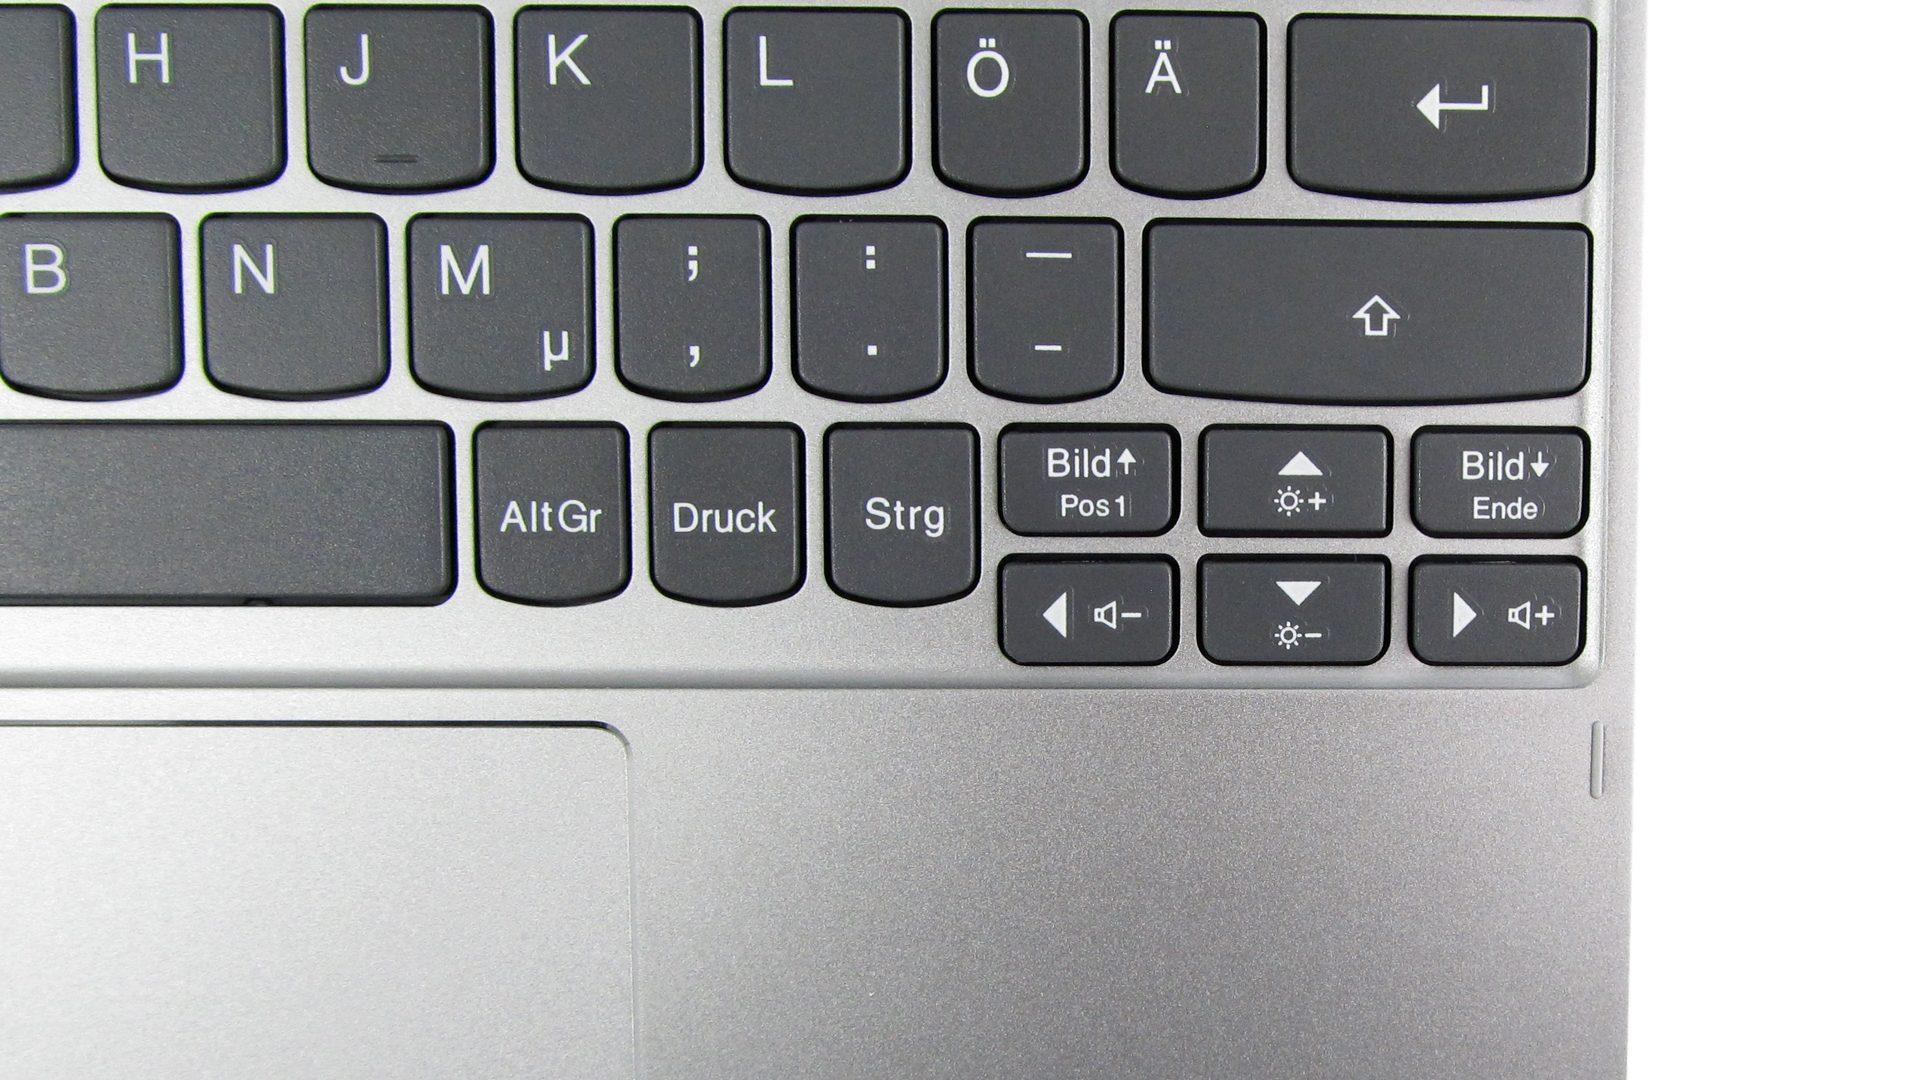 Lenovo-MIX-320-10ICR_Tastatur_2